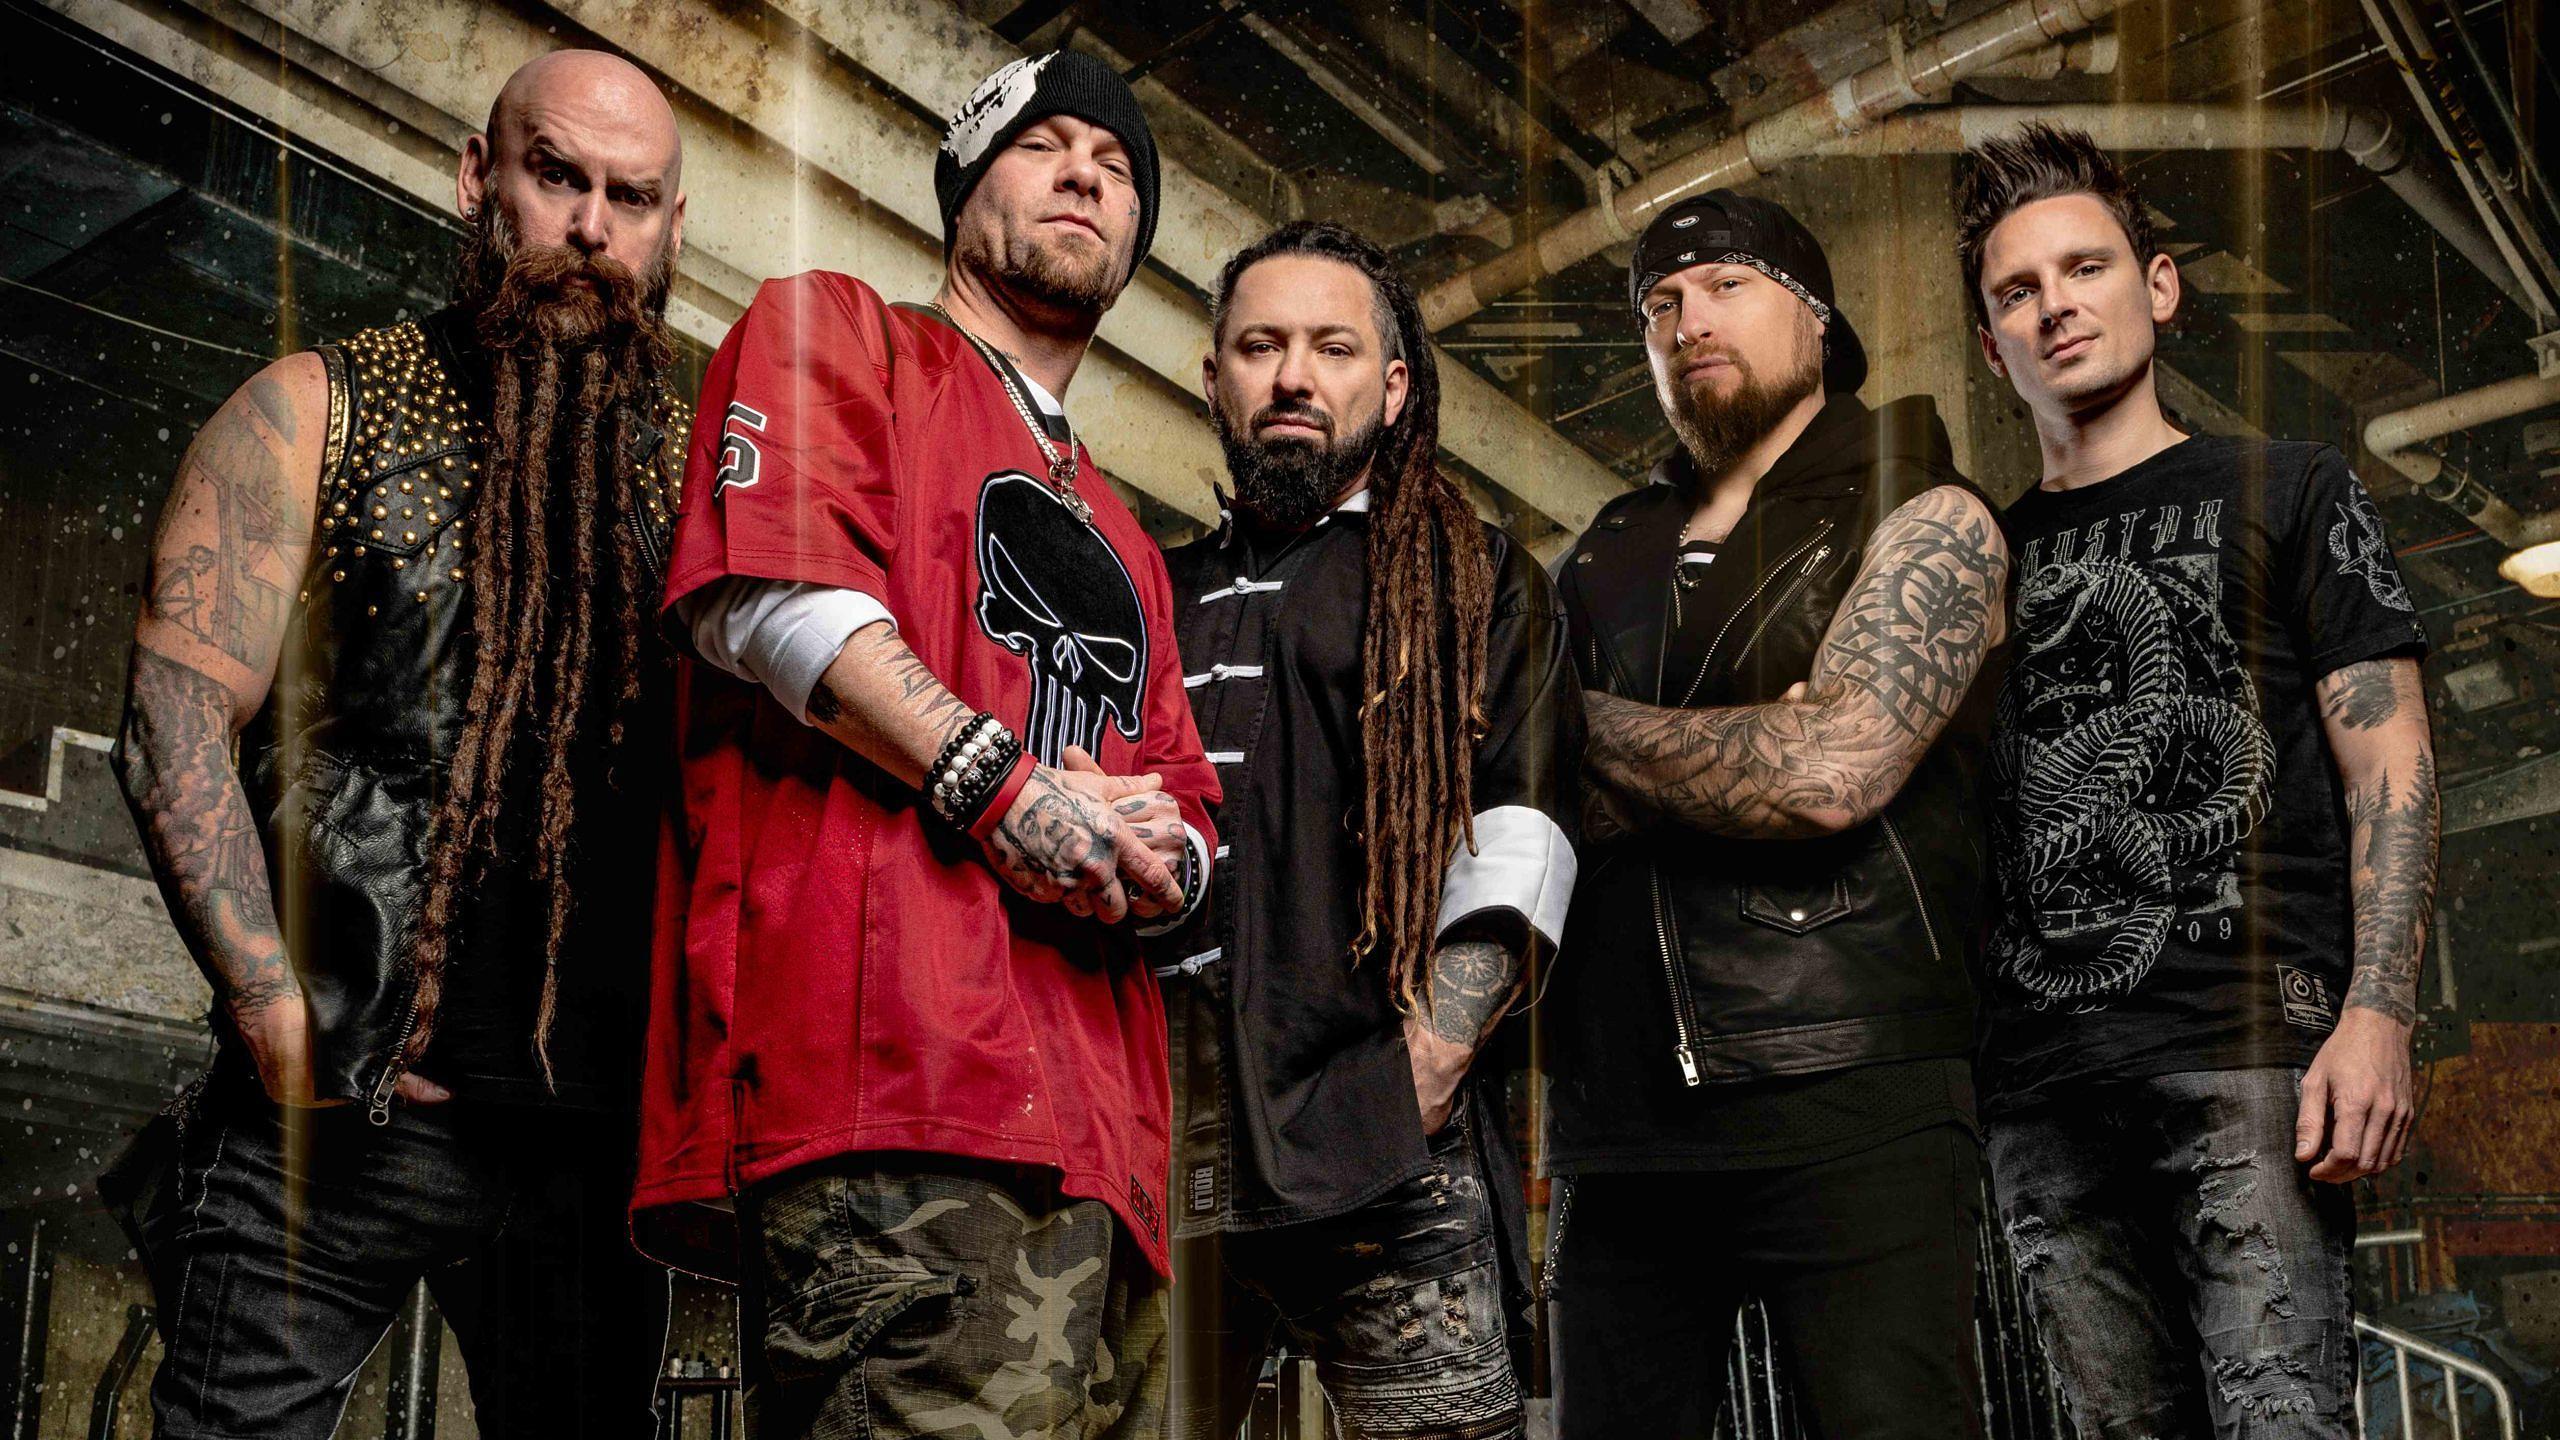 Five Finger Death Punch live 2022: Tour, Tickets, Termine, Städte